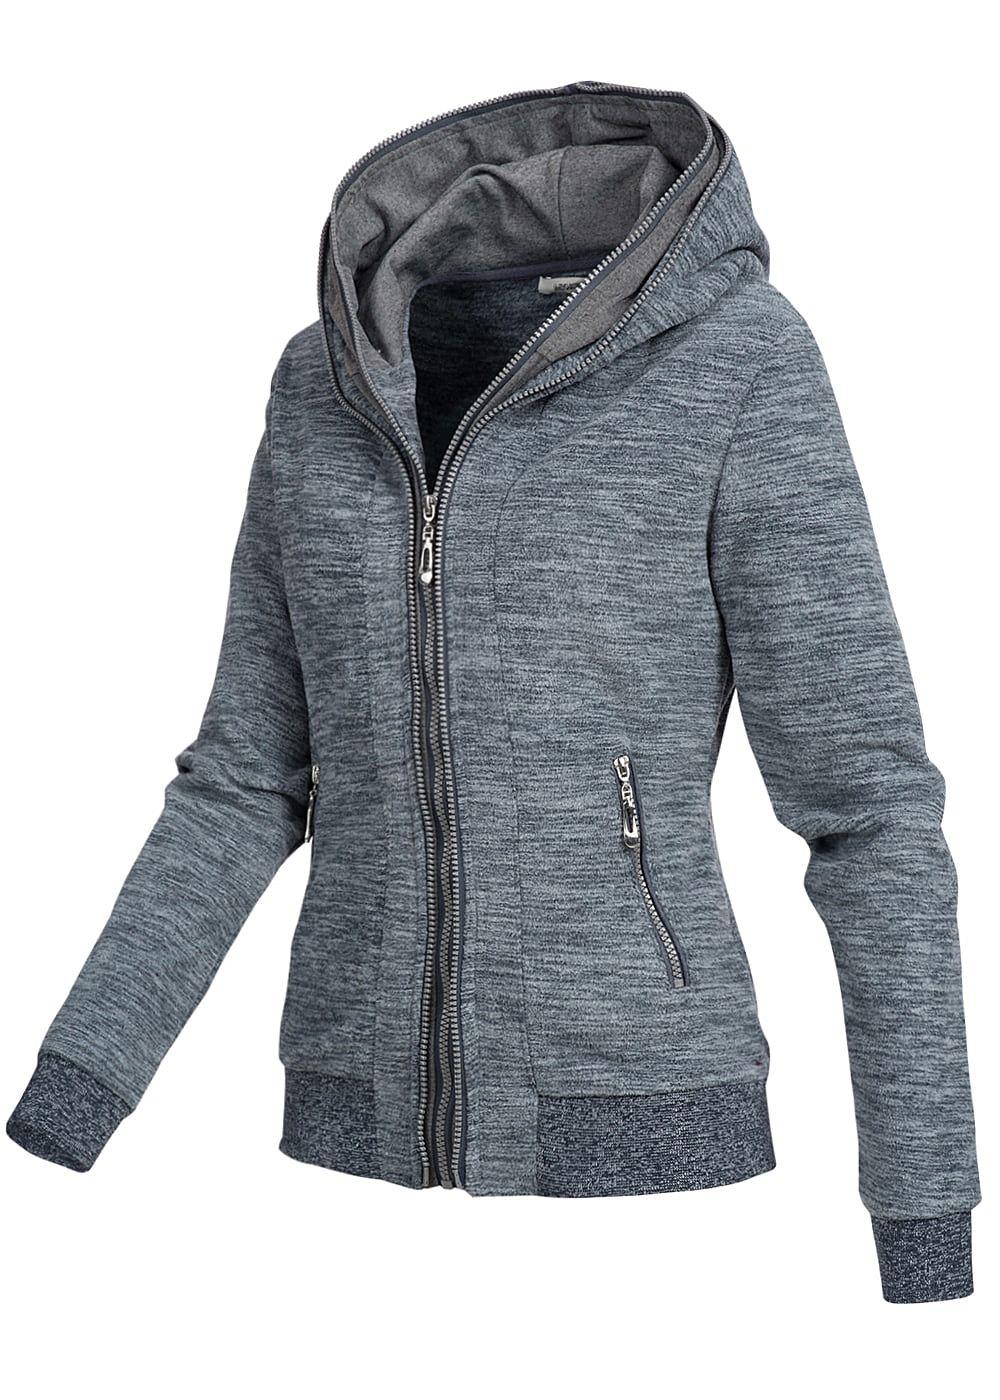 seventyseven lifestyle damen fleece zip hoodie kapuze 2 taschen blau melange 77onlineshop. Black Bedroom Furniture Sets. Home Design Ideas